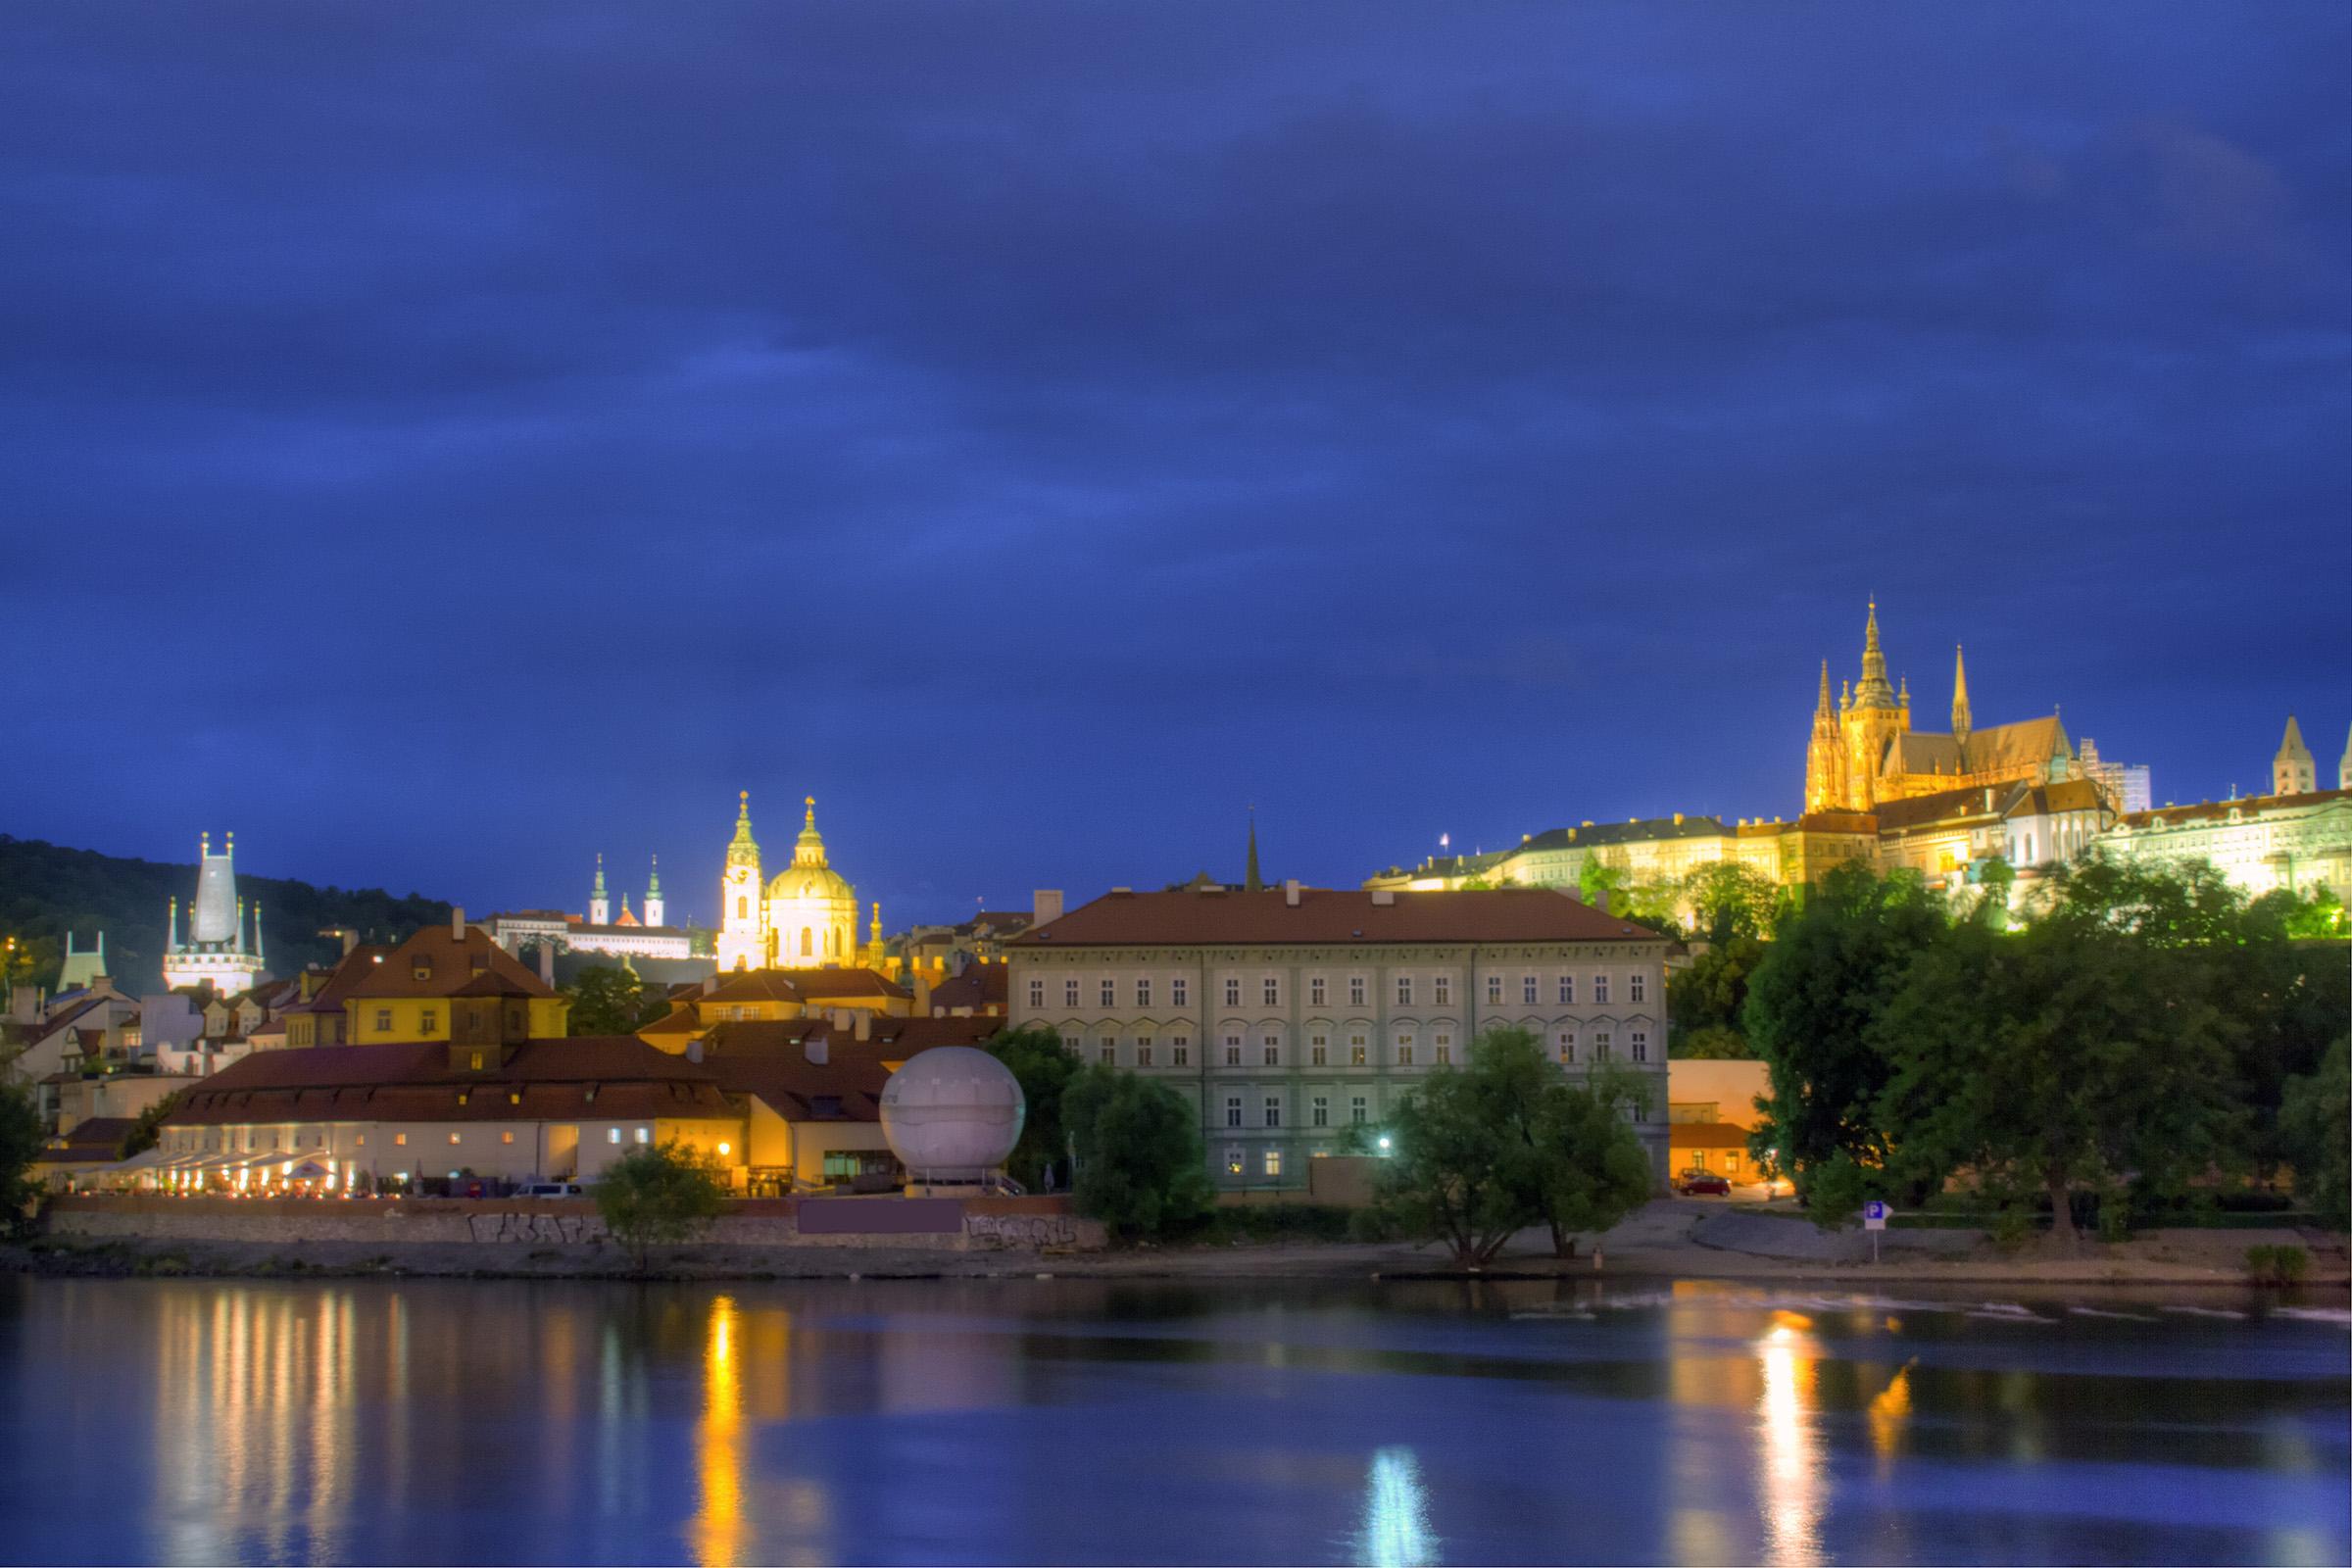 Prague at night, Ancient, Royal, Palace, Prague, HQ Photo